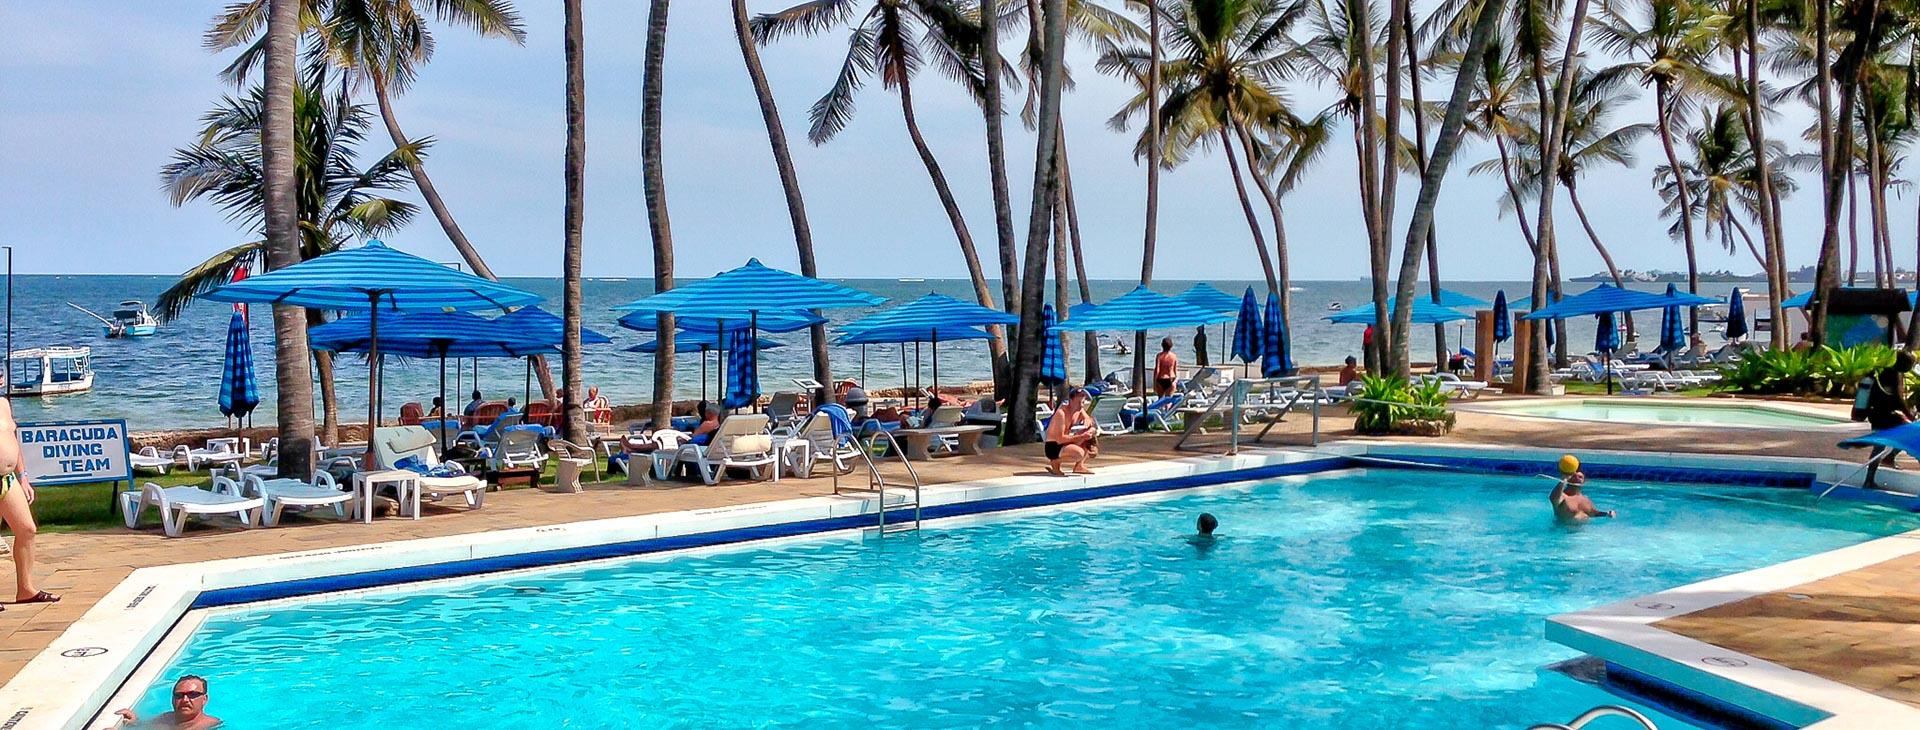 Kenya Bay Kenia, Wybrzeże Mombasy, Mombasa-Bamburi Beach